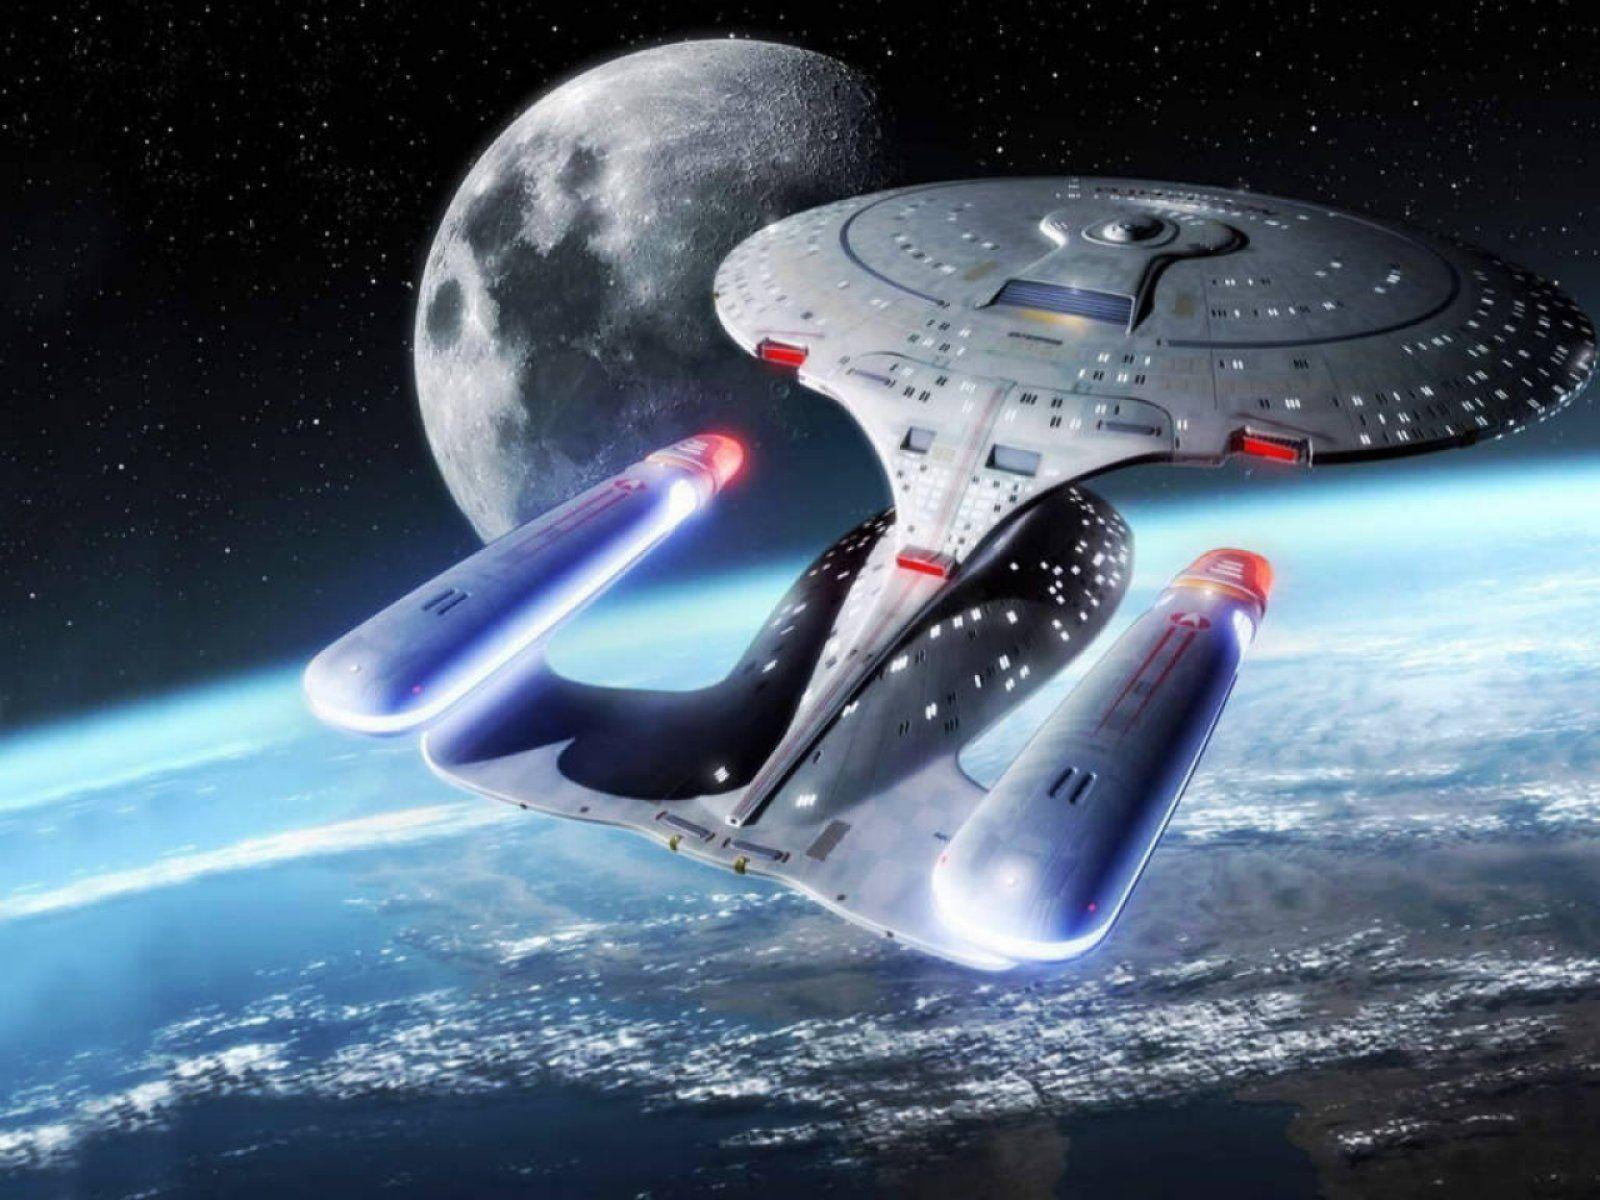 Star Trek Enterprise Wallpapers - Wallpaper Cave